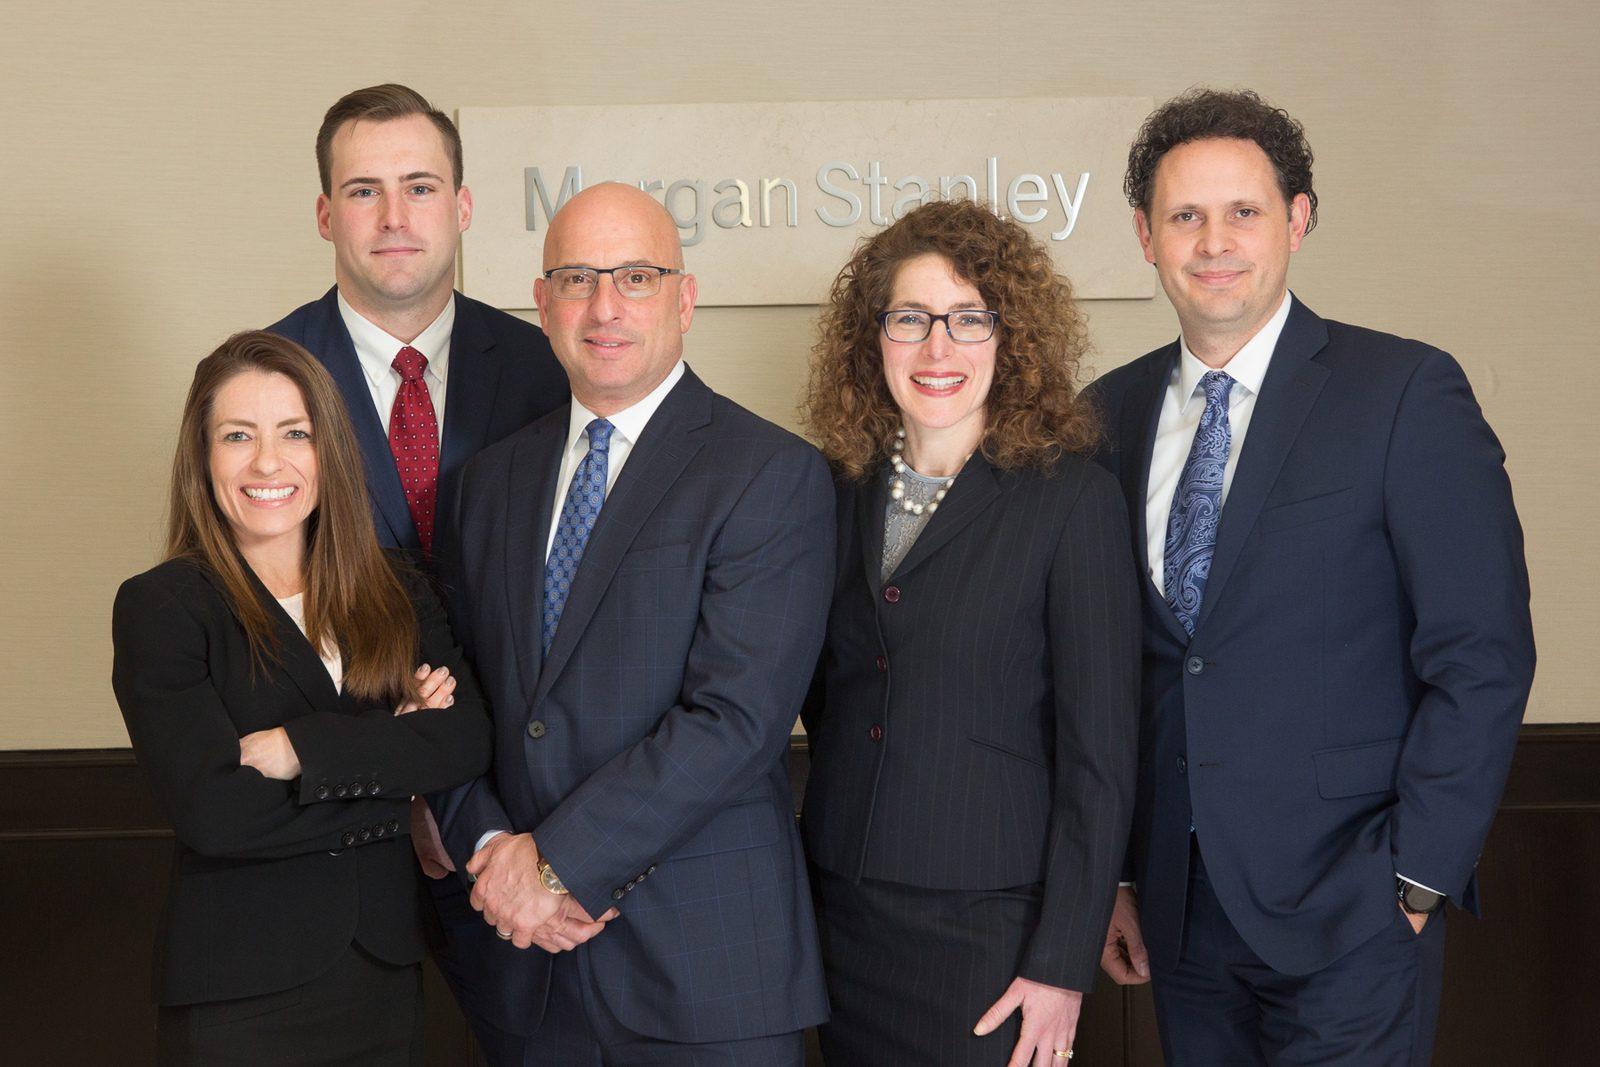 The Sterling Group | Wellesley, MA | Morgan Stanley Wealth